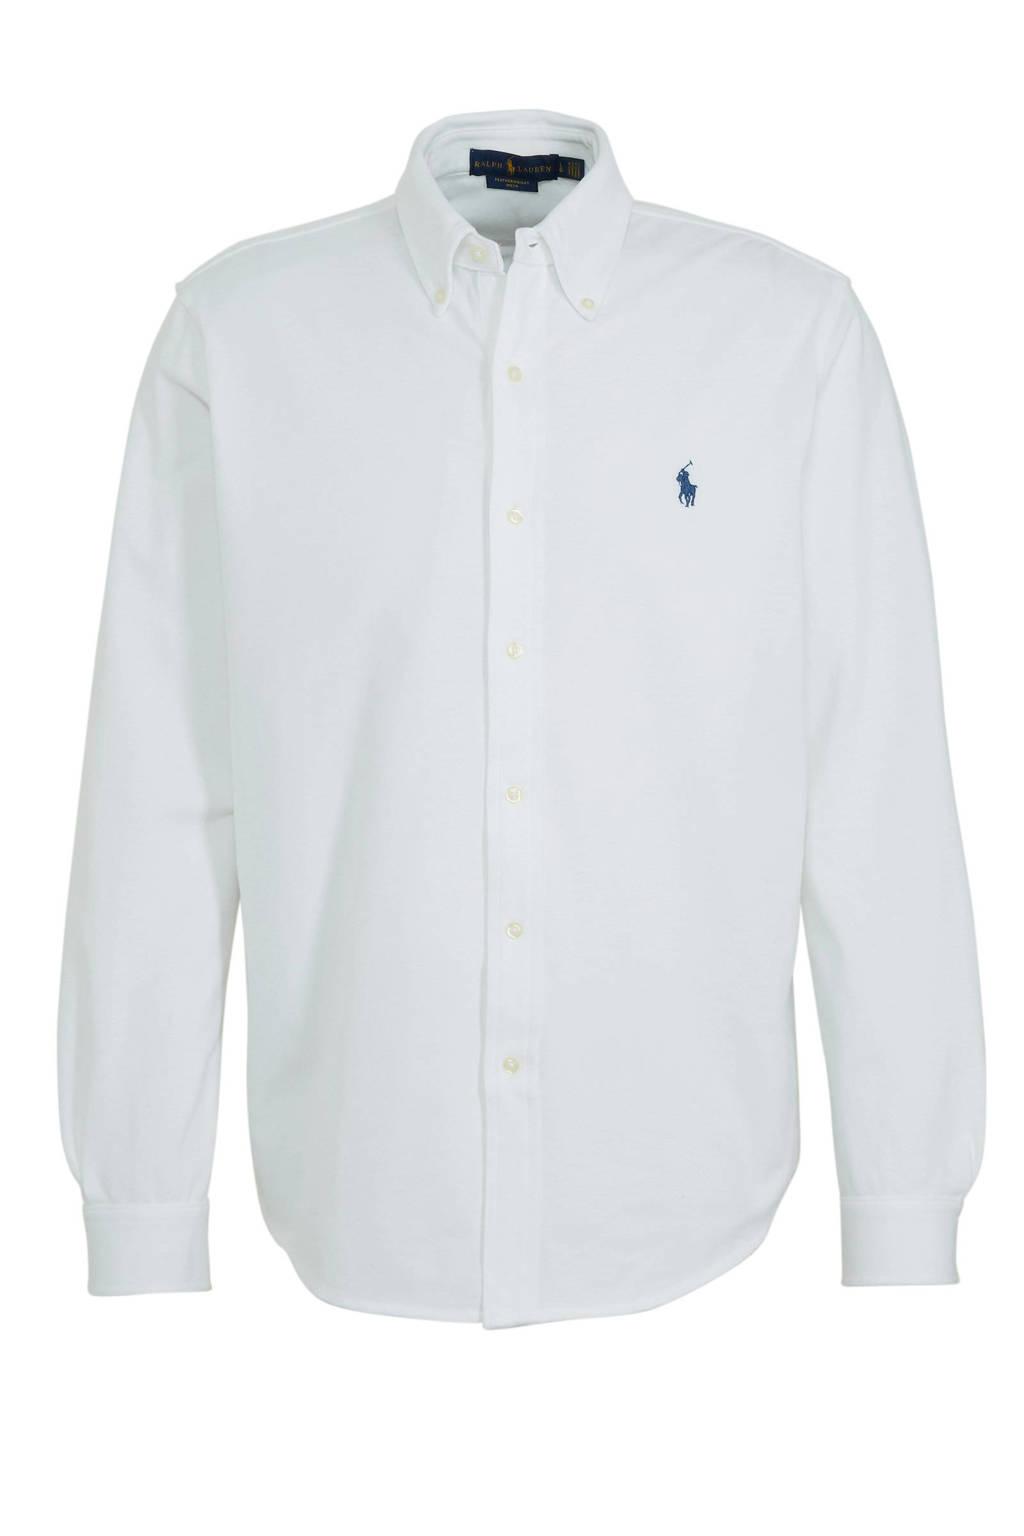 POLO Ralph Lauren regular fit overhemd wit, Wit